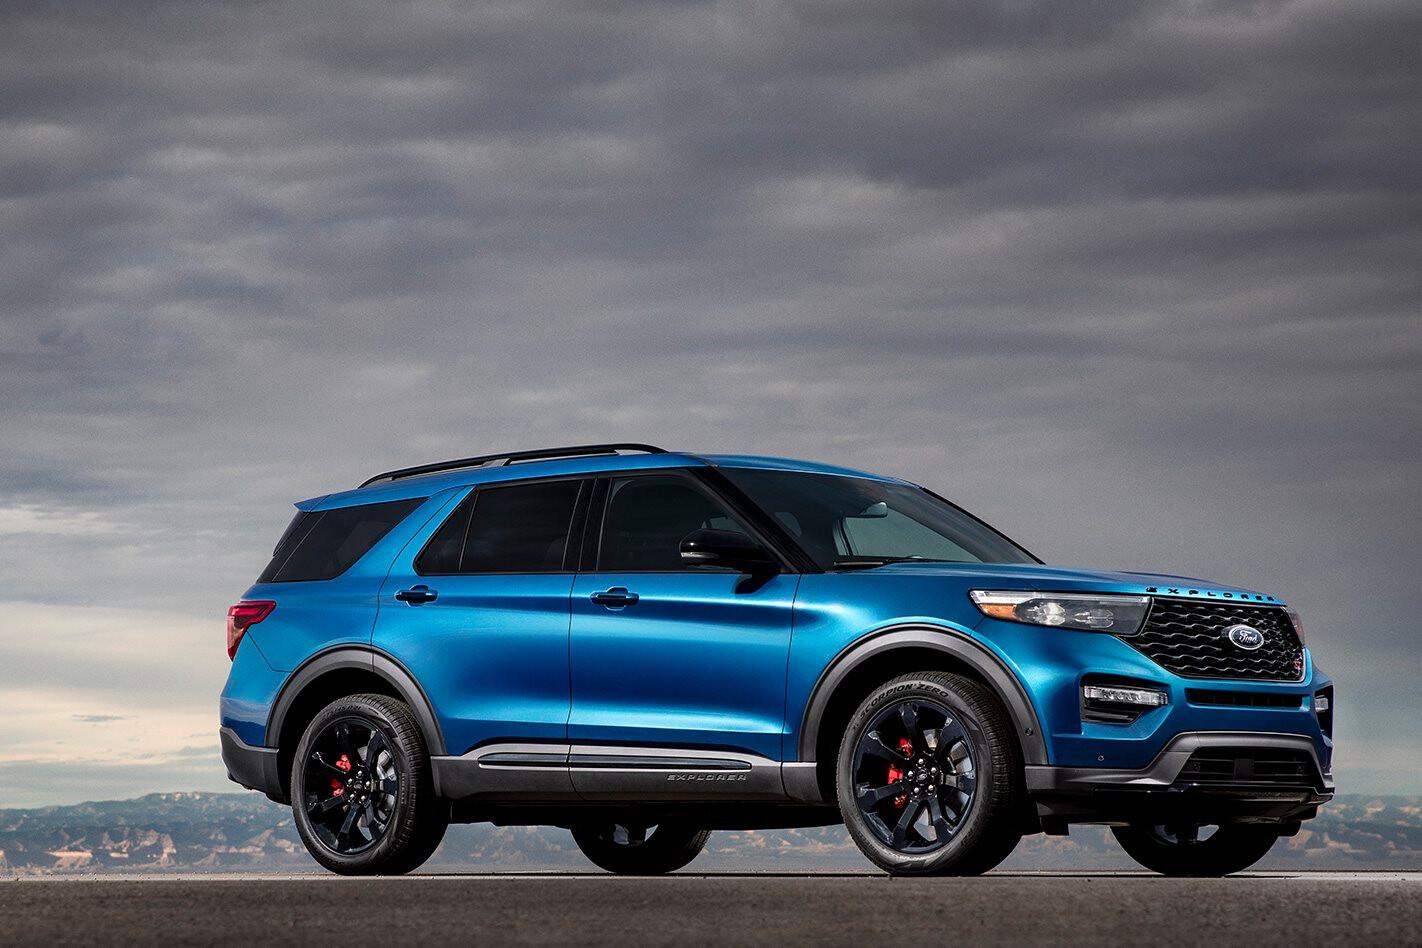 Ford Explorer 2019 blue